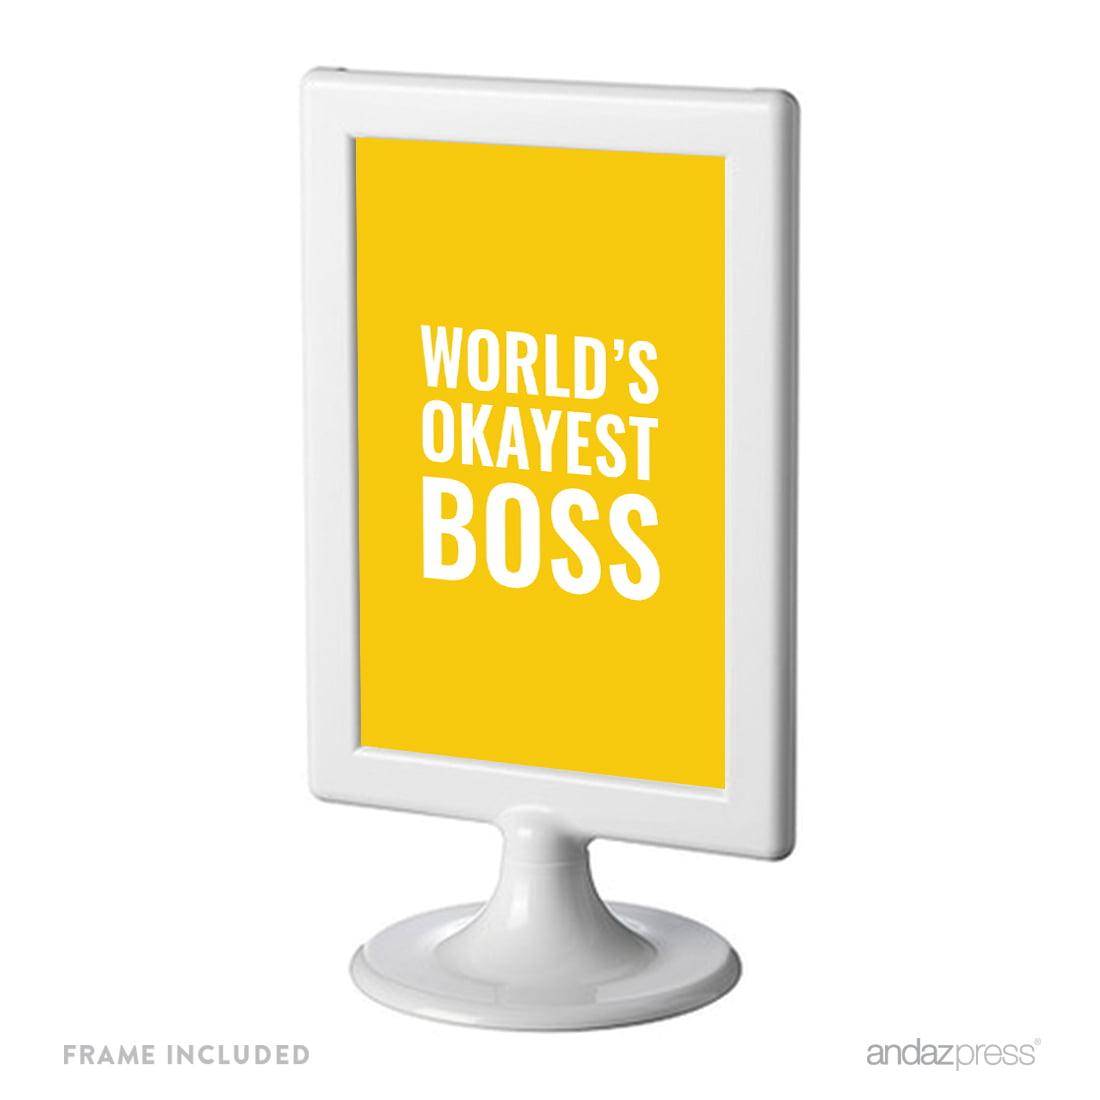 World\'s Okayest Boss Funny & Inspirational Quotes Office Framed Desk ...